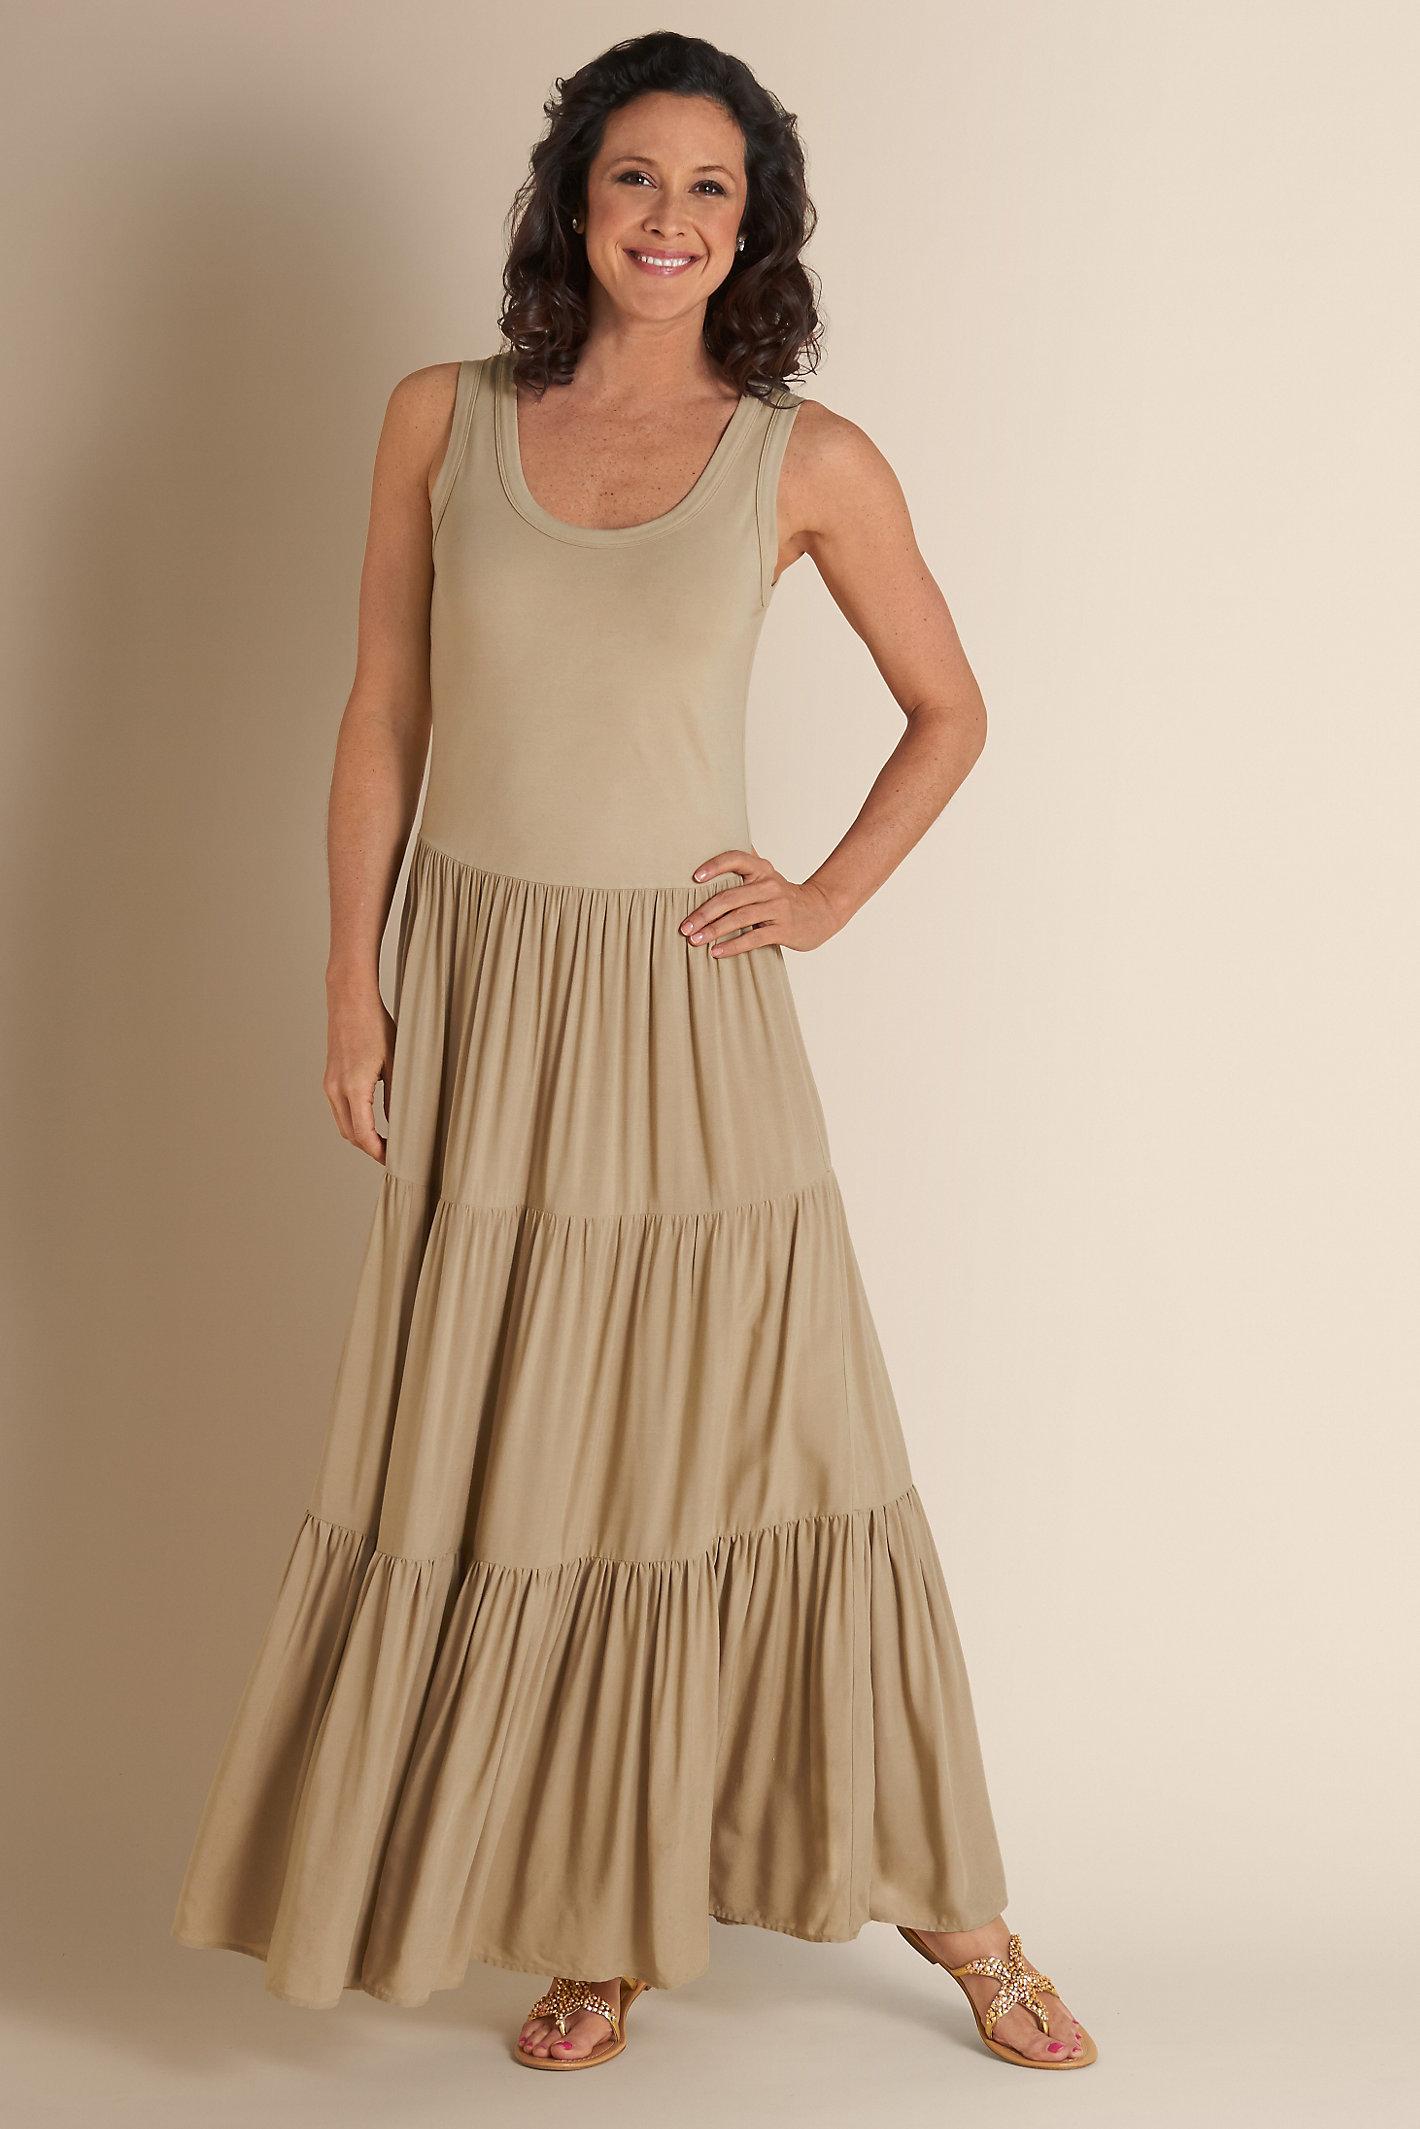 Petite Slimming Maxi Dress